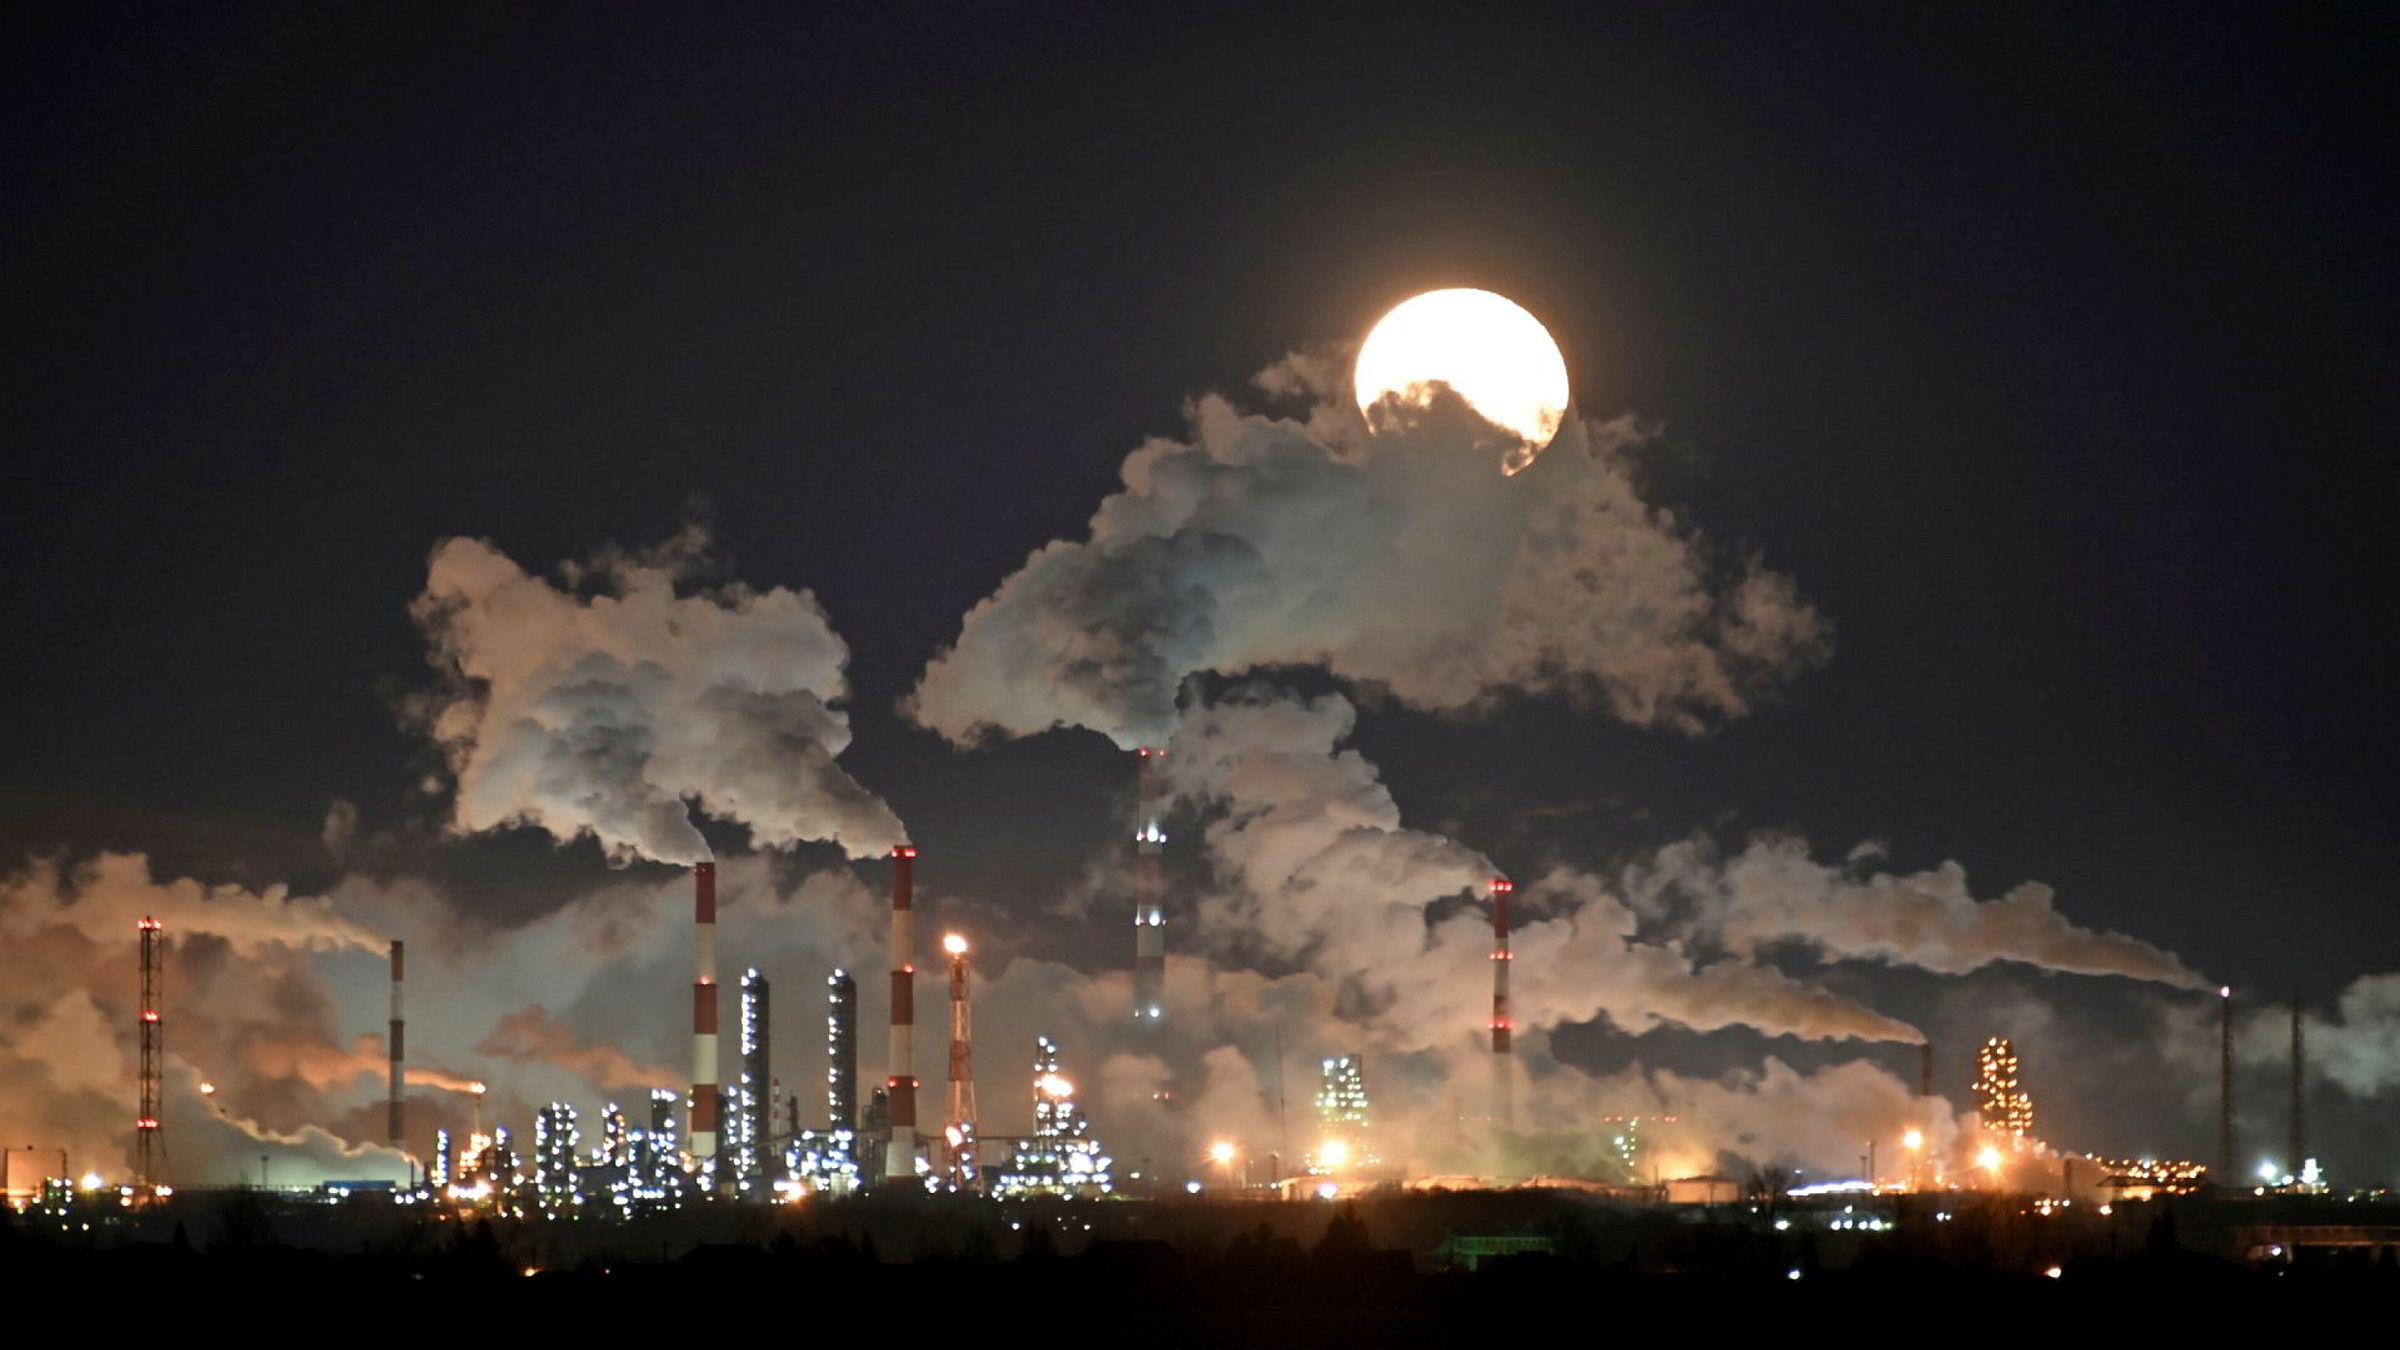 På bildet vises russiske Gazproms oljeraffinieri i Omsk i Russland.